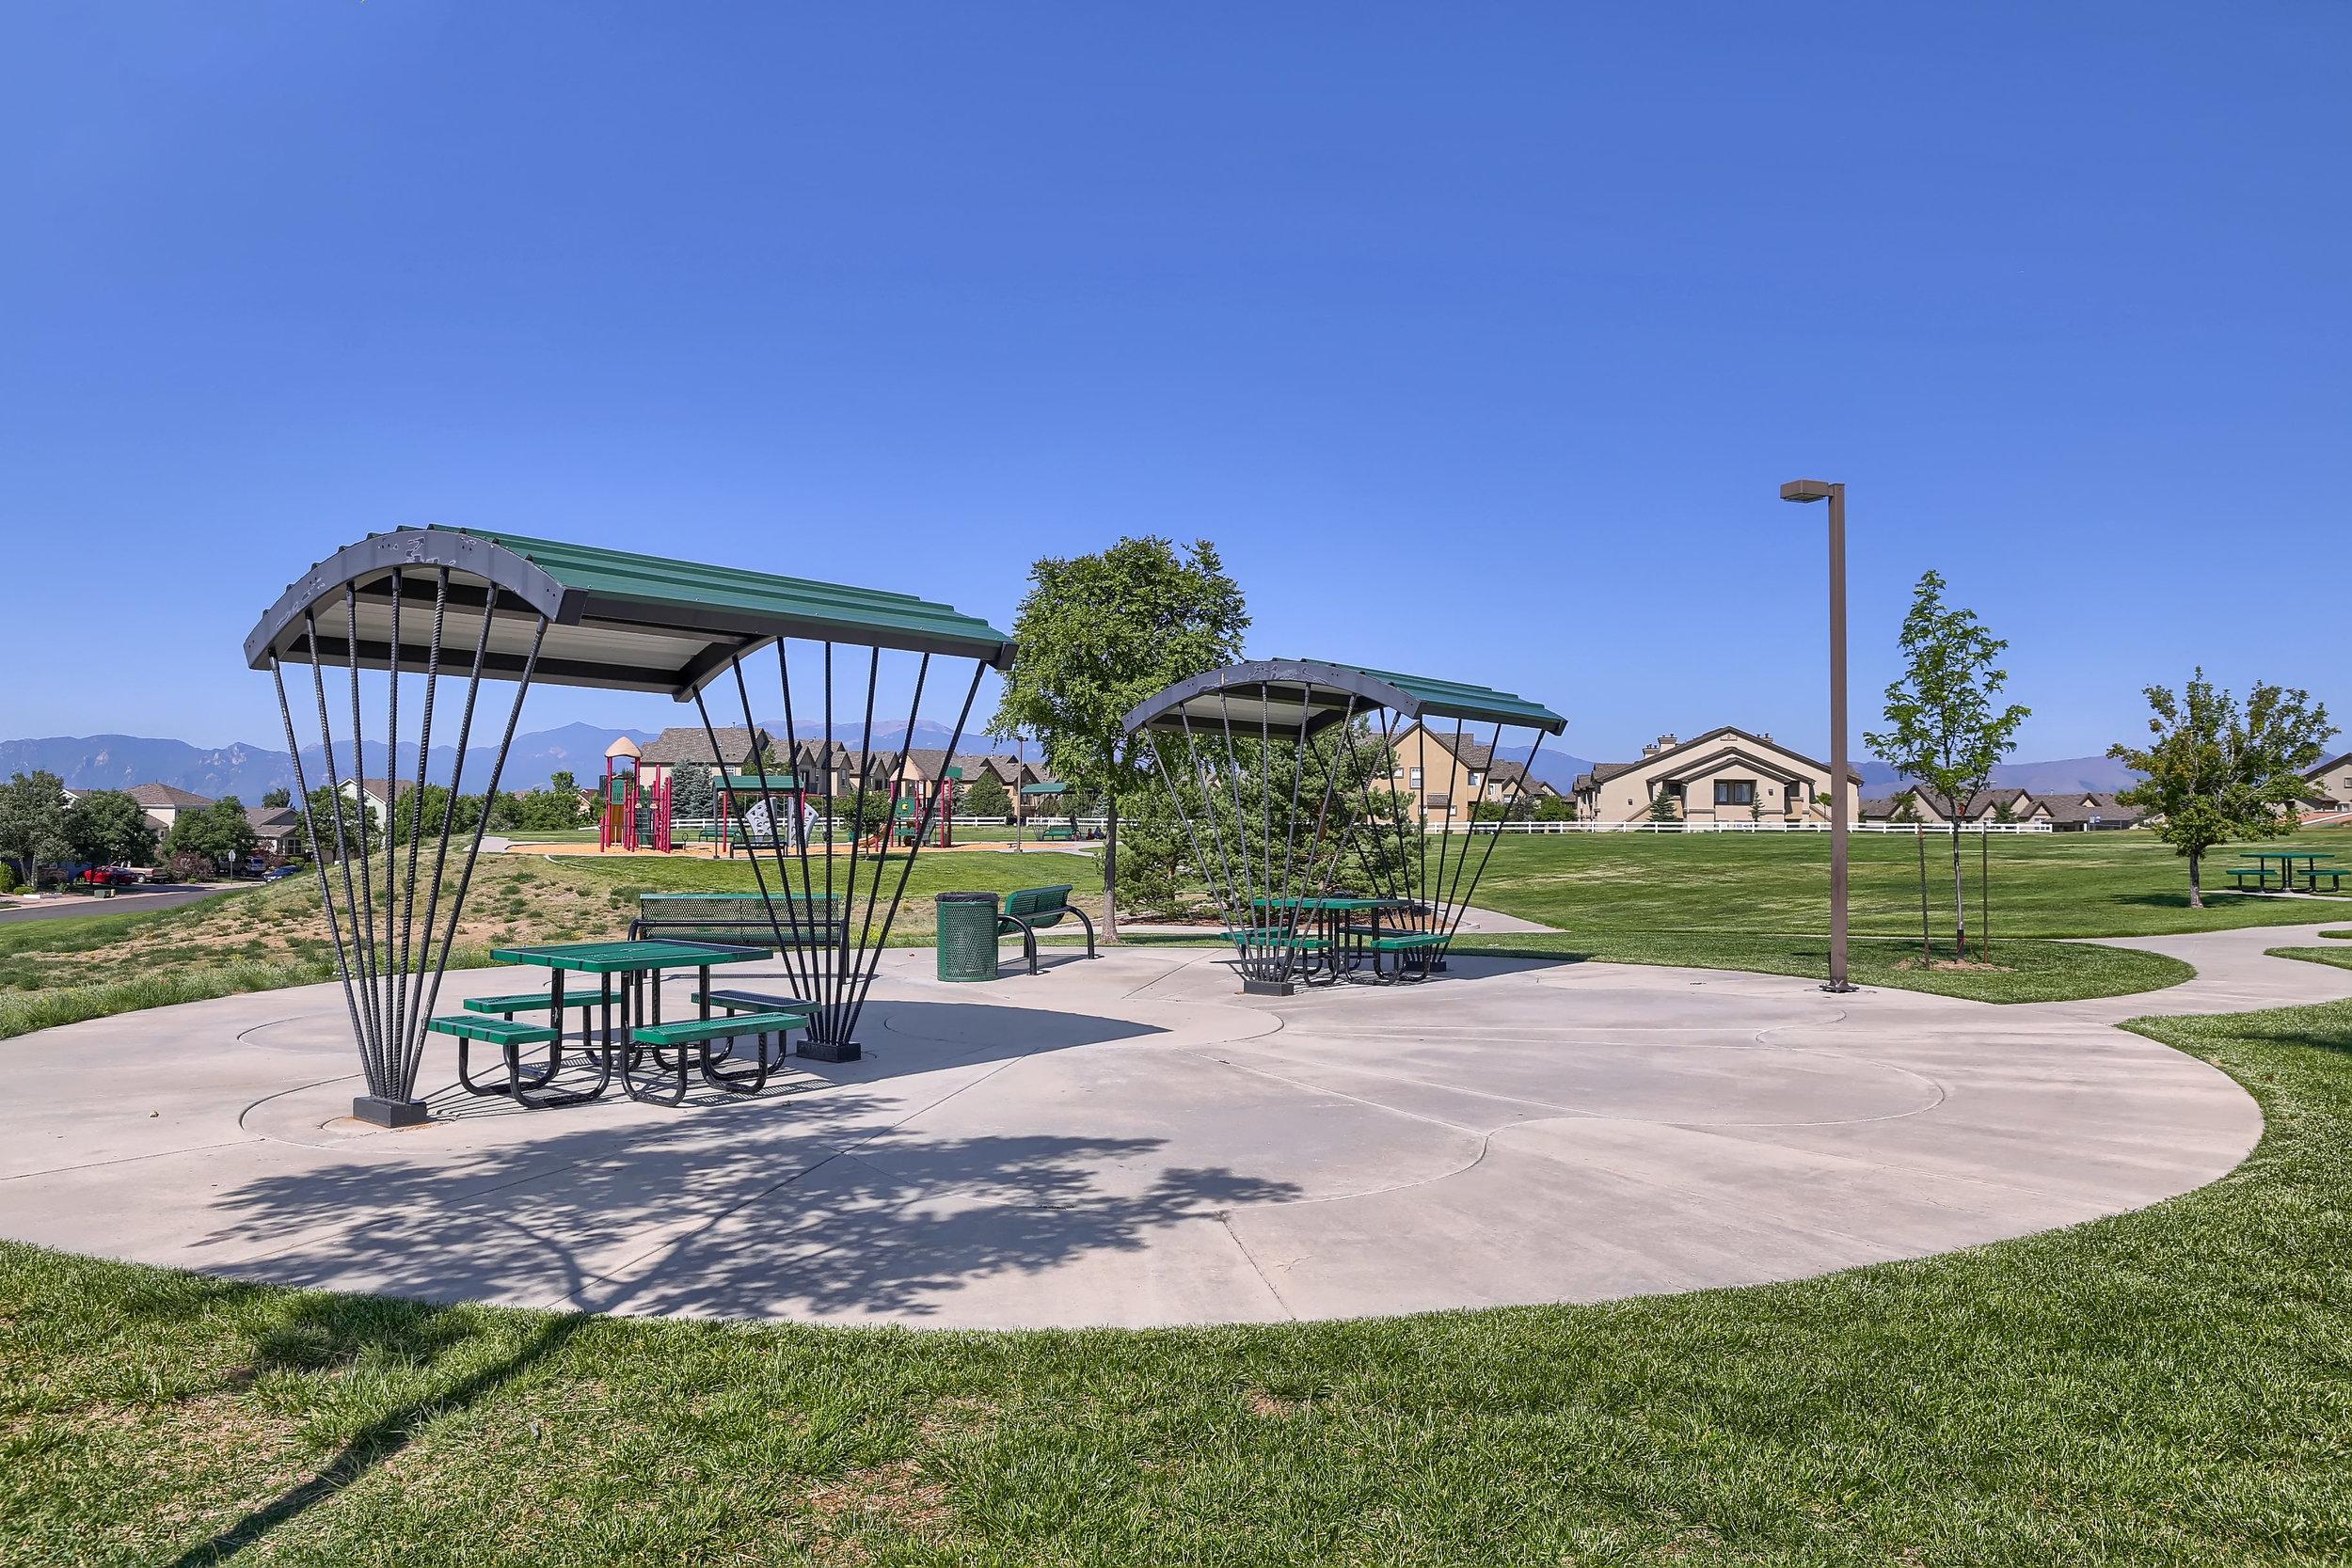 7414 Campstool Drive Colorado-print-046-045-Neighborhood-3648x2432-300dpi.jpg